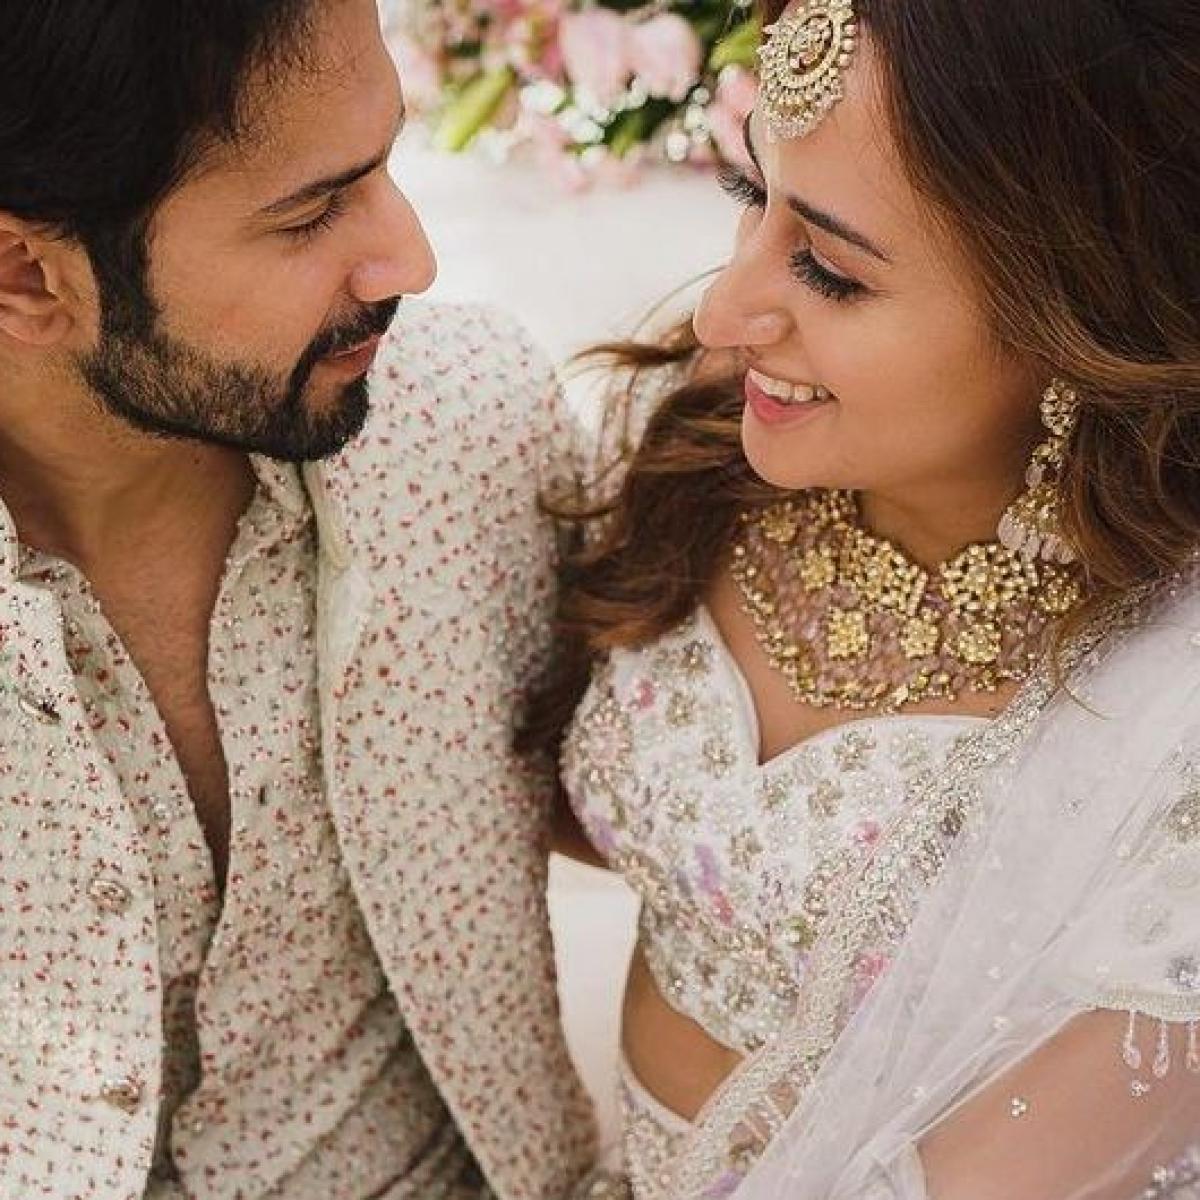 Varun Dhawan thanks fans for 'love and positivity' post marriage to Natasha Dalal